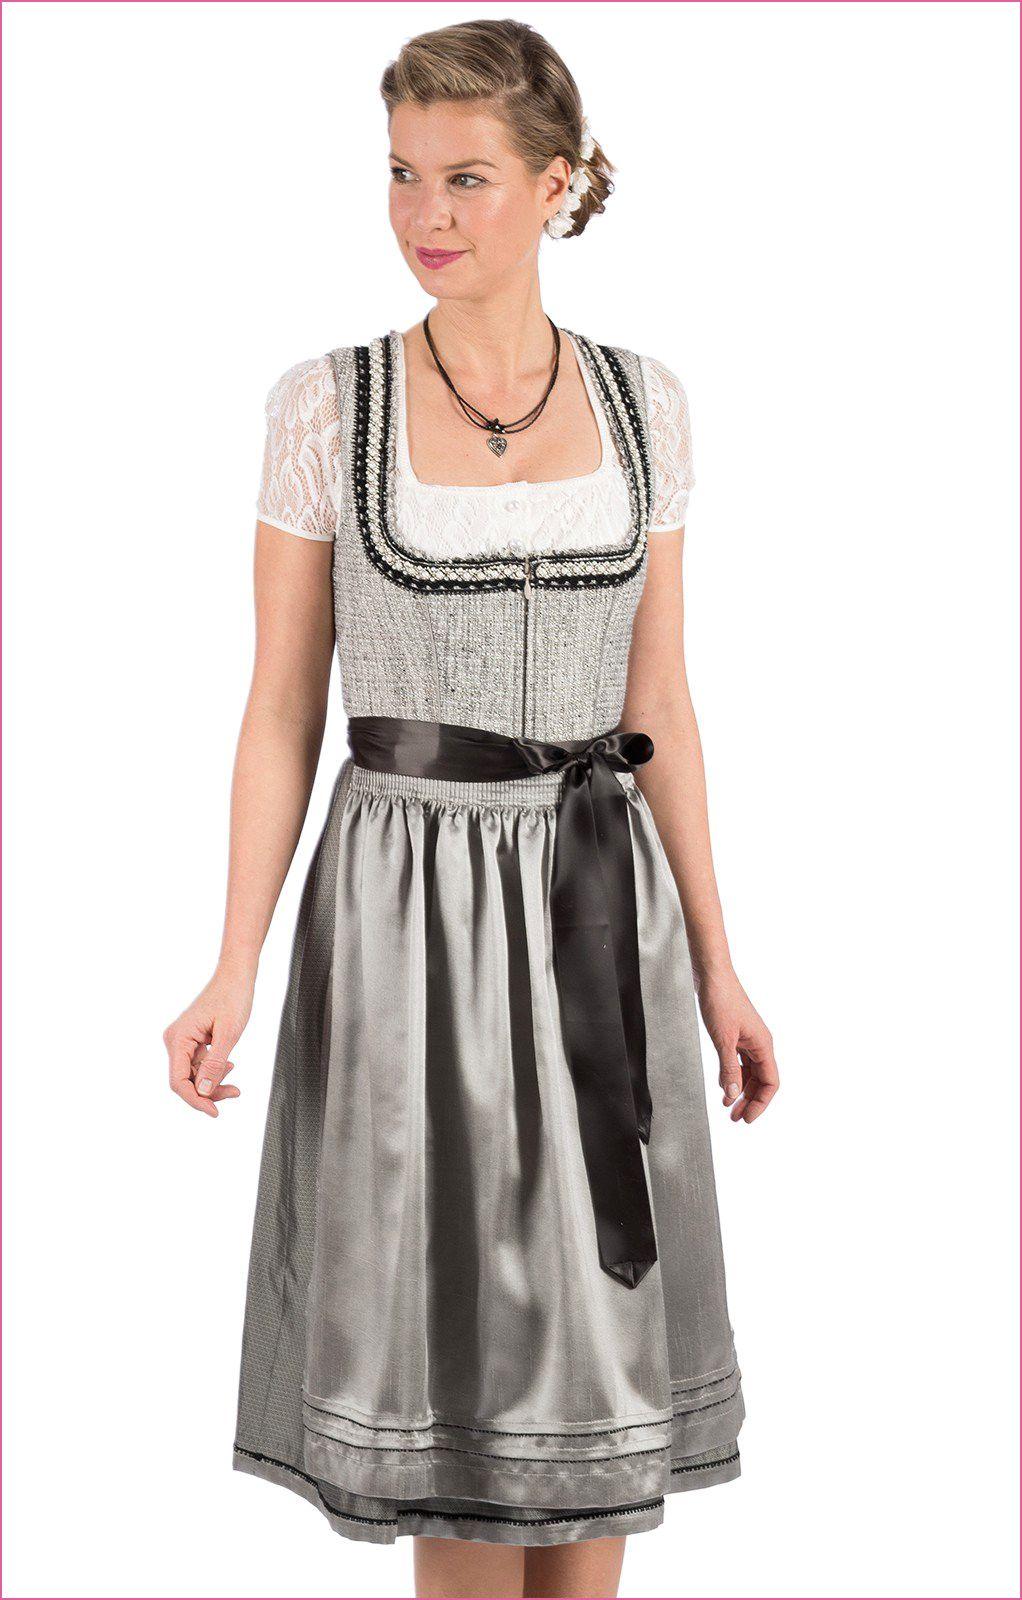 genial kleid lang eng | shirt dress, dresses, lace dress black